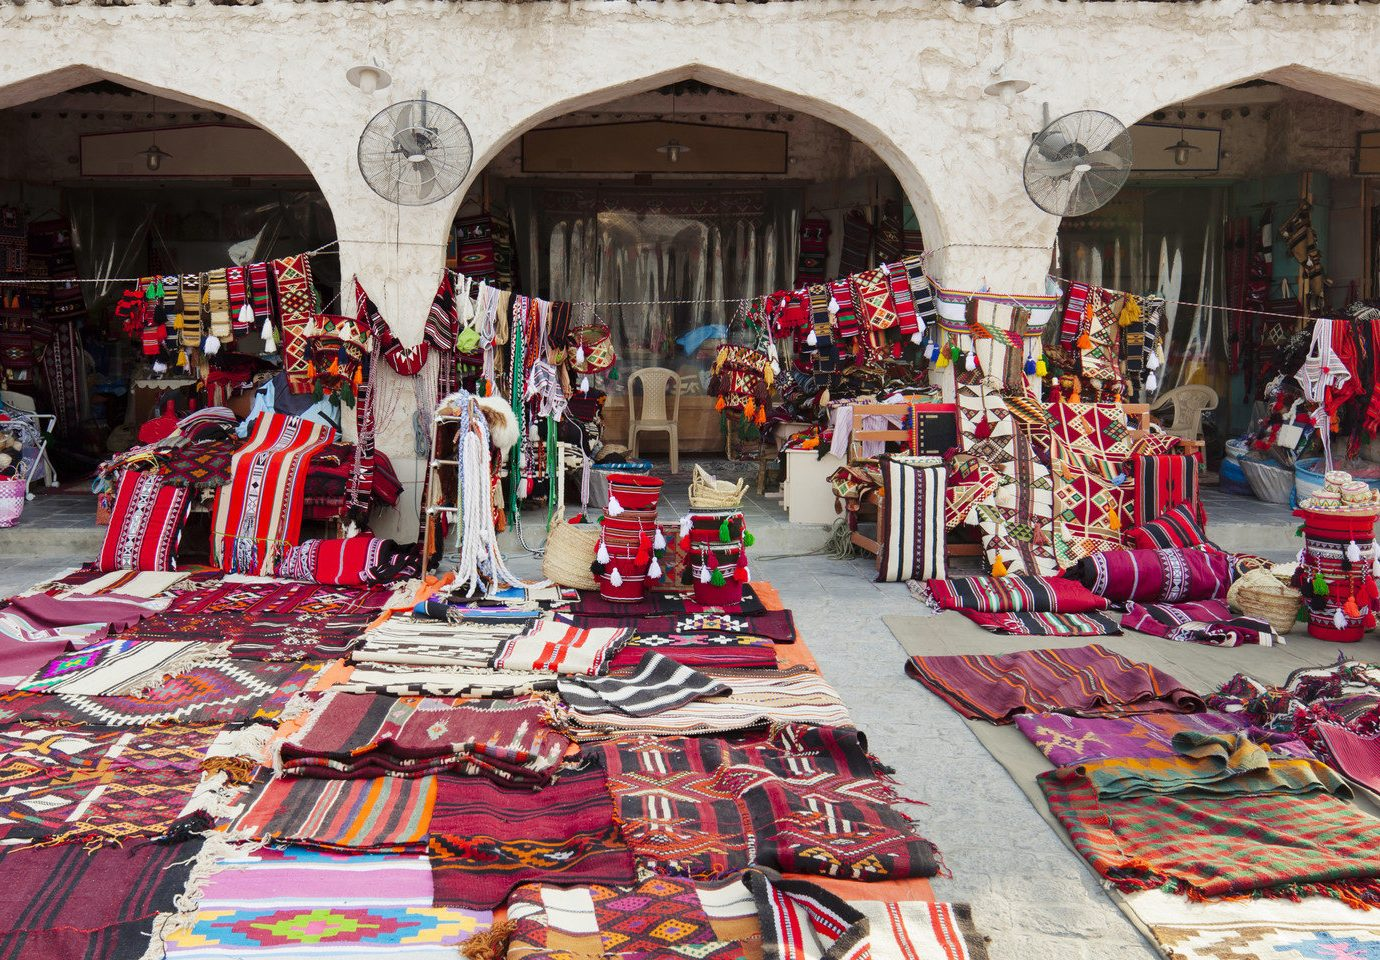 Trip Ideas market bazaar marketplace City public space human settlement art retail tradition stall decorated